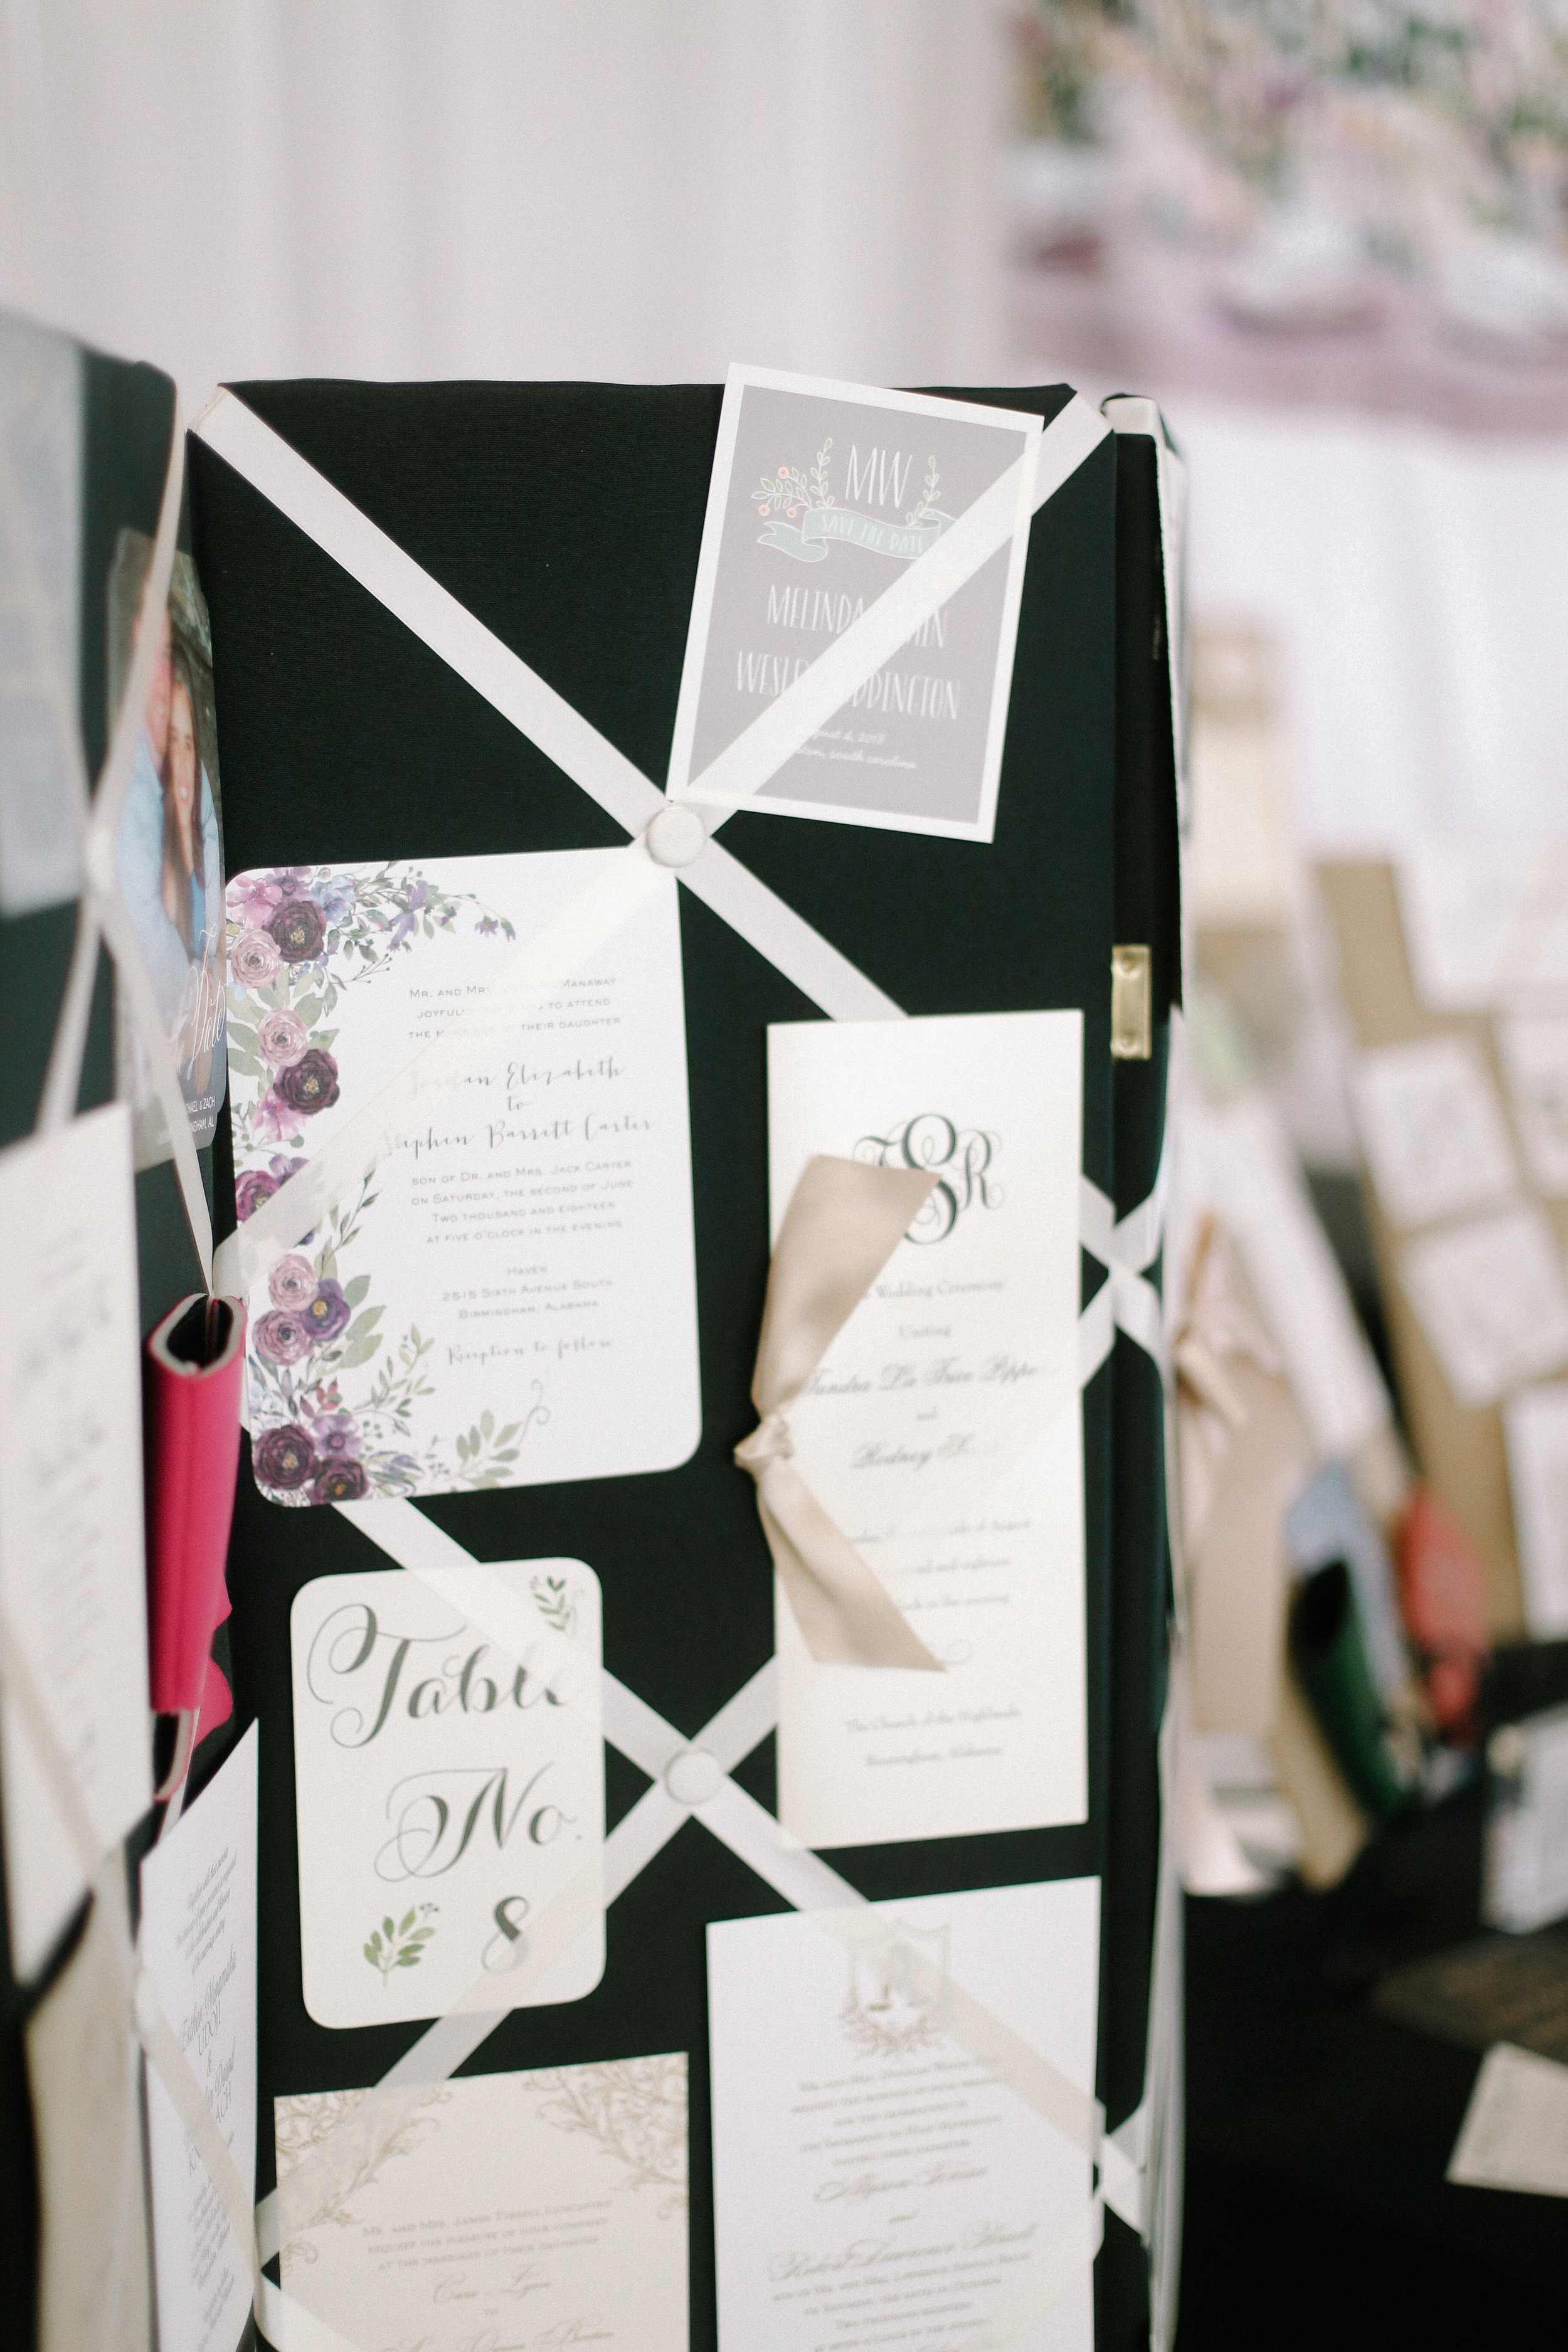 Engaged Event-Engaged Event-0107.jpg